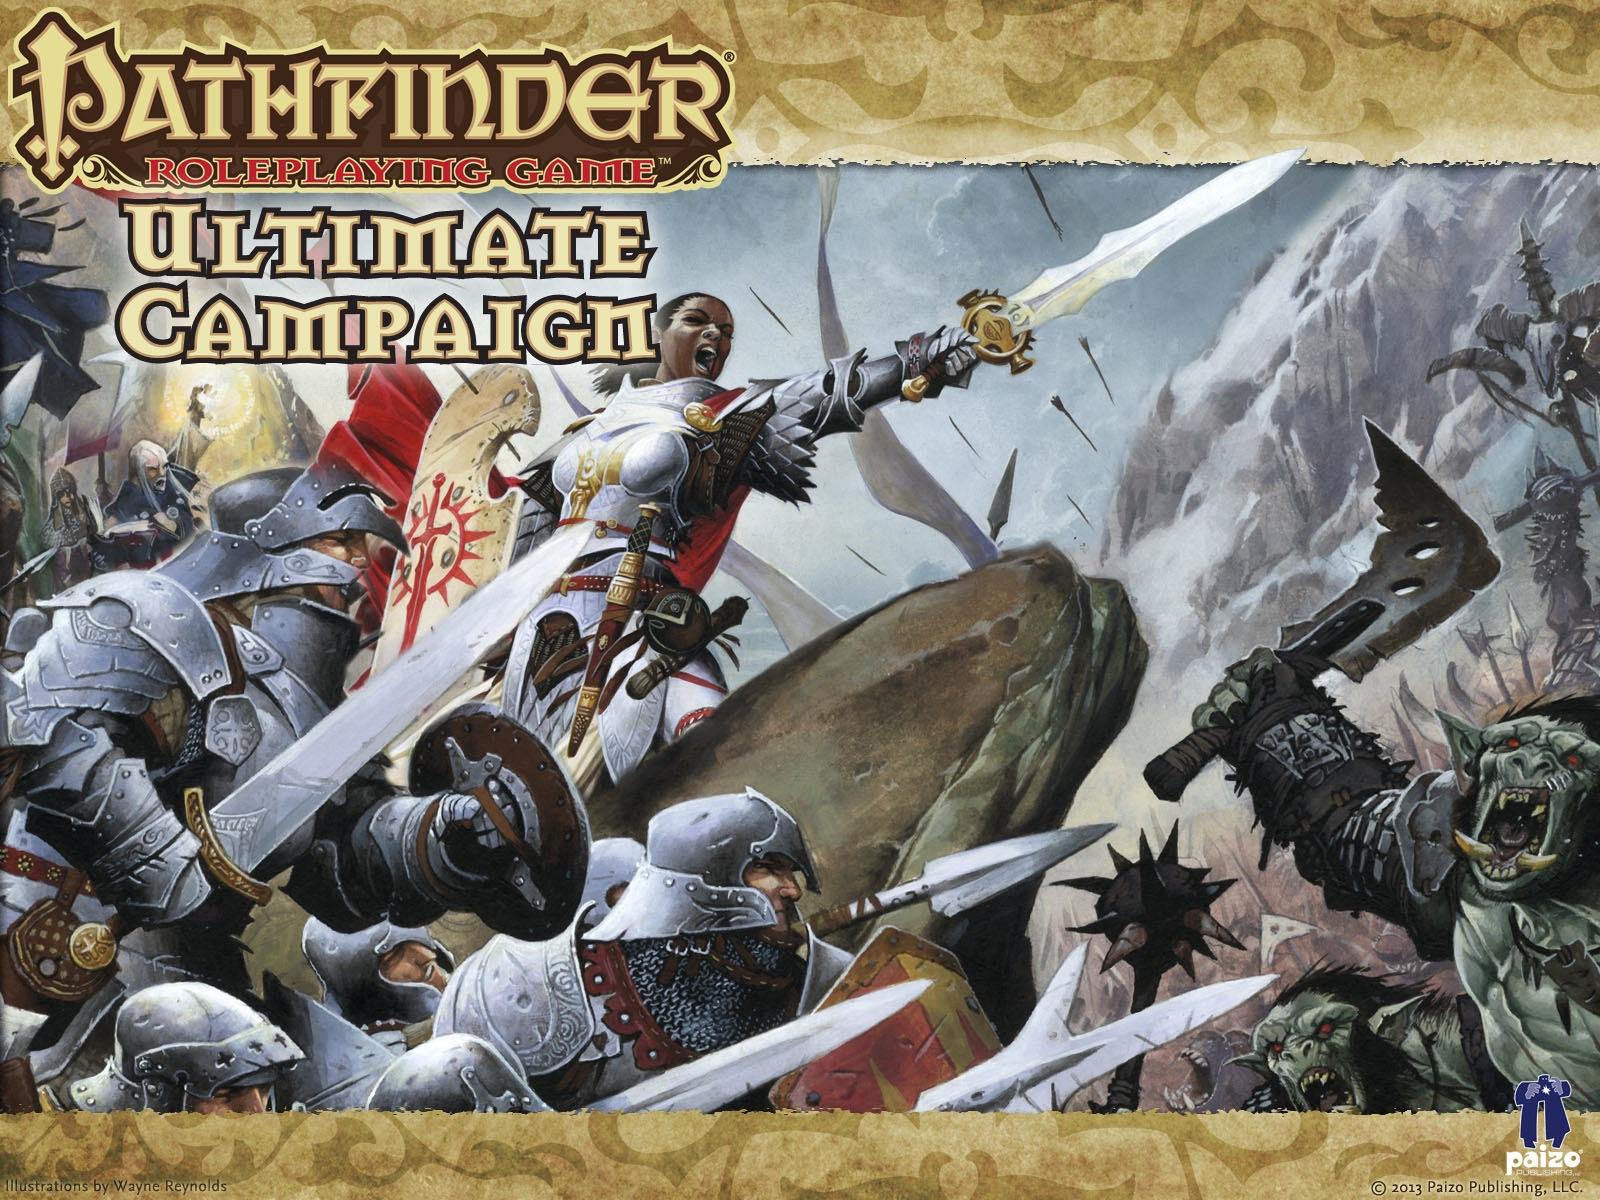 1600 x 1200 · 603 kB · jpeg, Pathfinder RPG